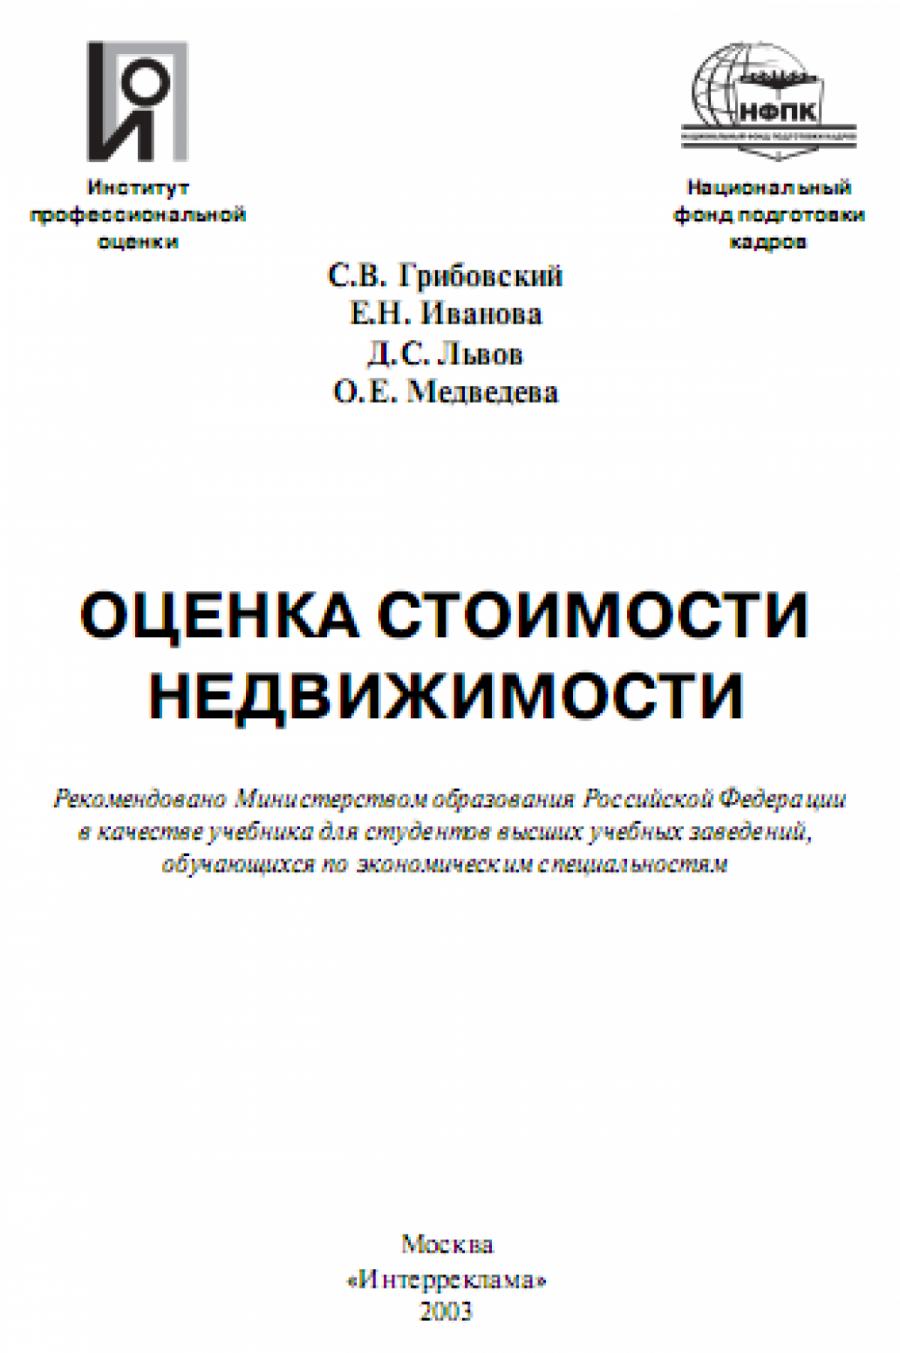 Обложка книги:  грибовский с. в. , иванова е. н. , львов д. с. , медведева о. е. - оценка стоимости недвижимости